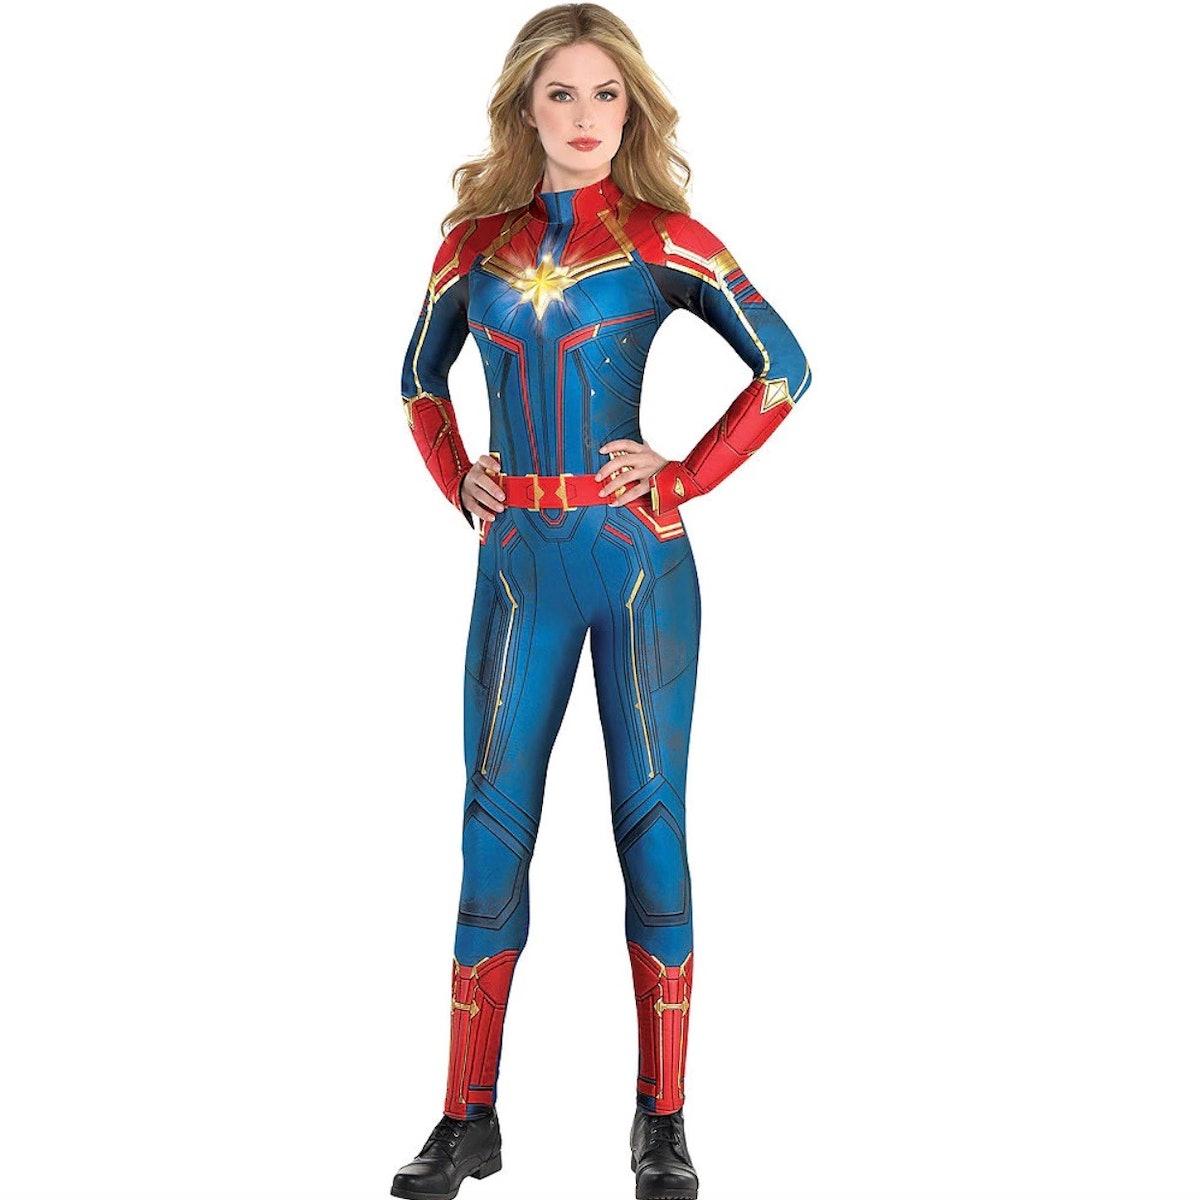 Adult Light-Up Captain Marvel Costume - Captain Marvel